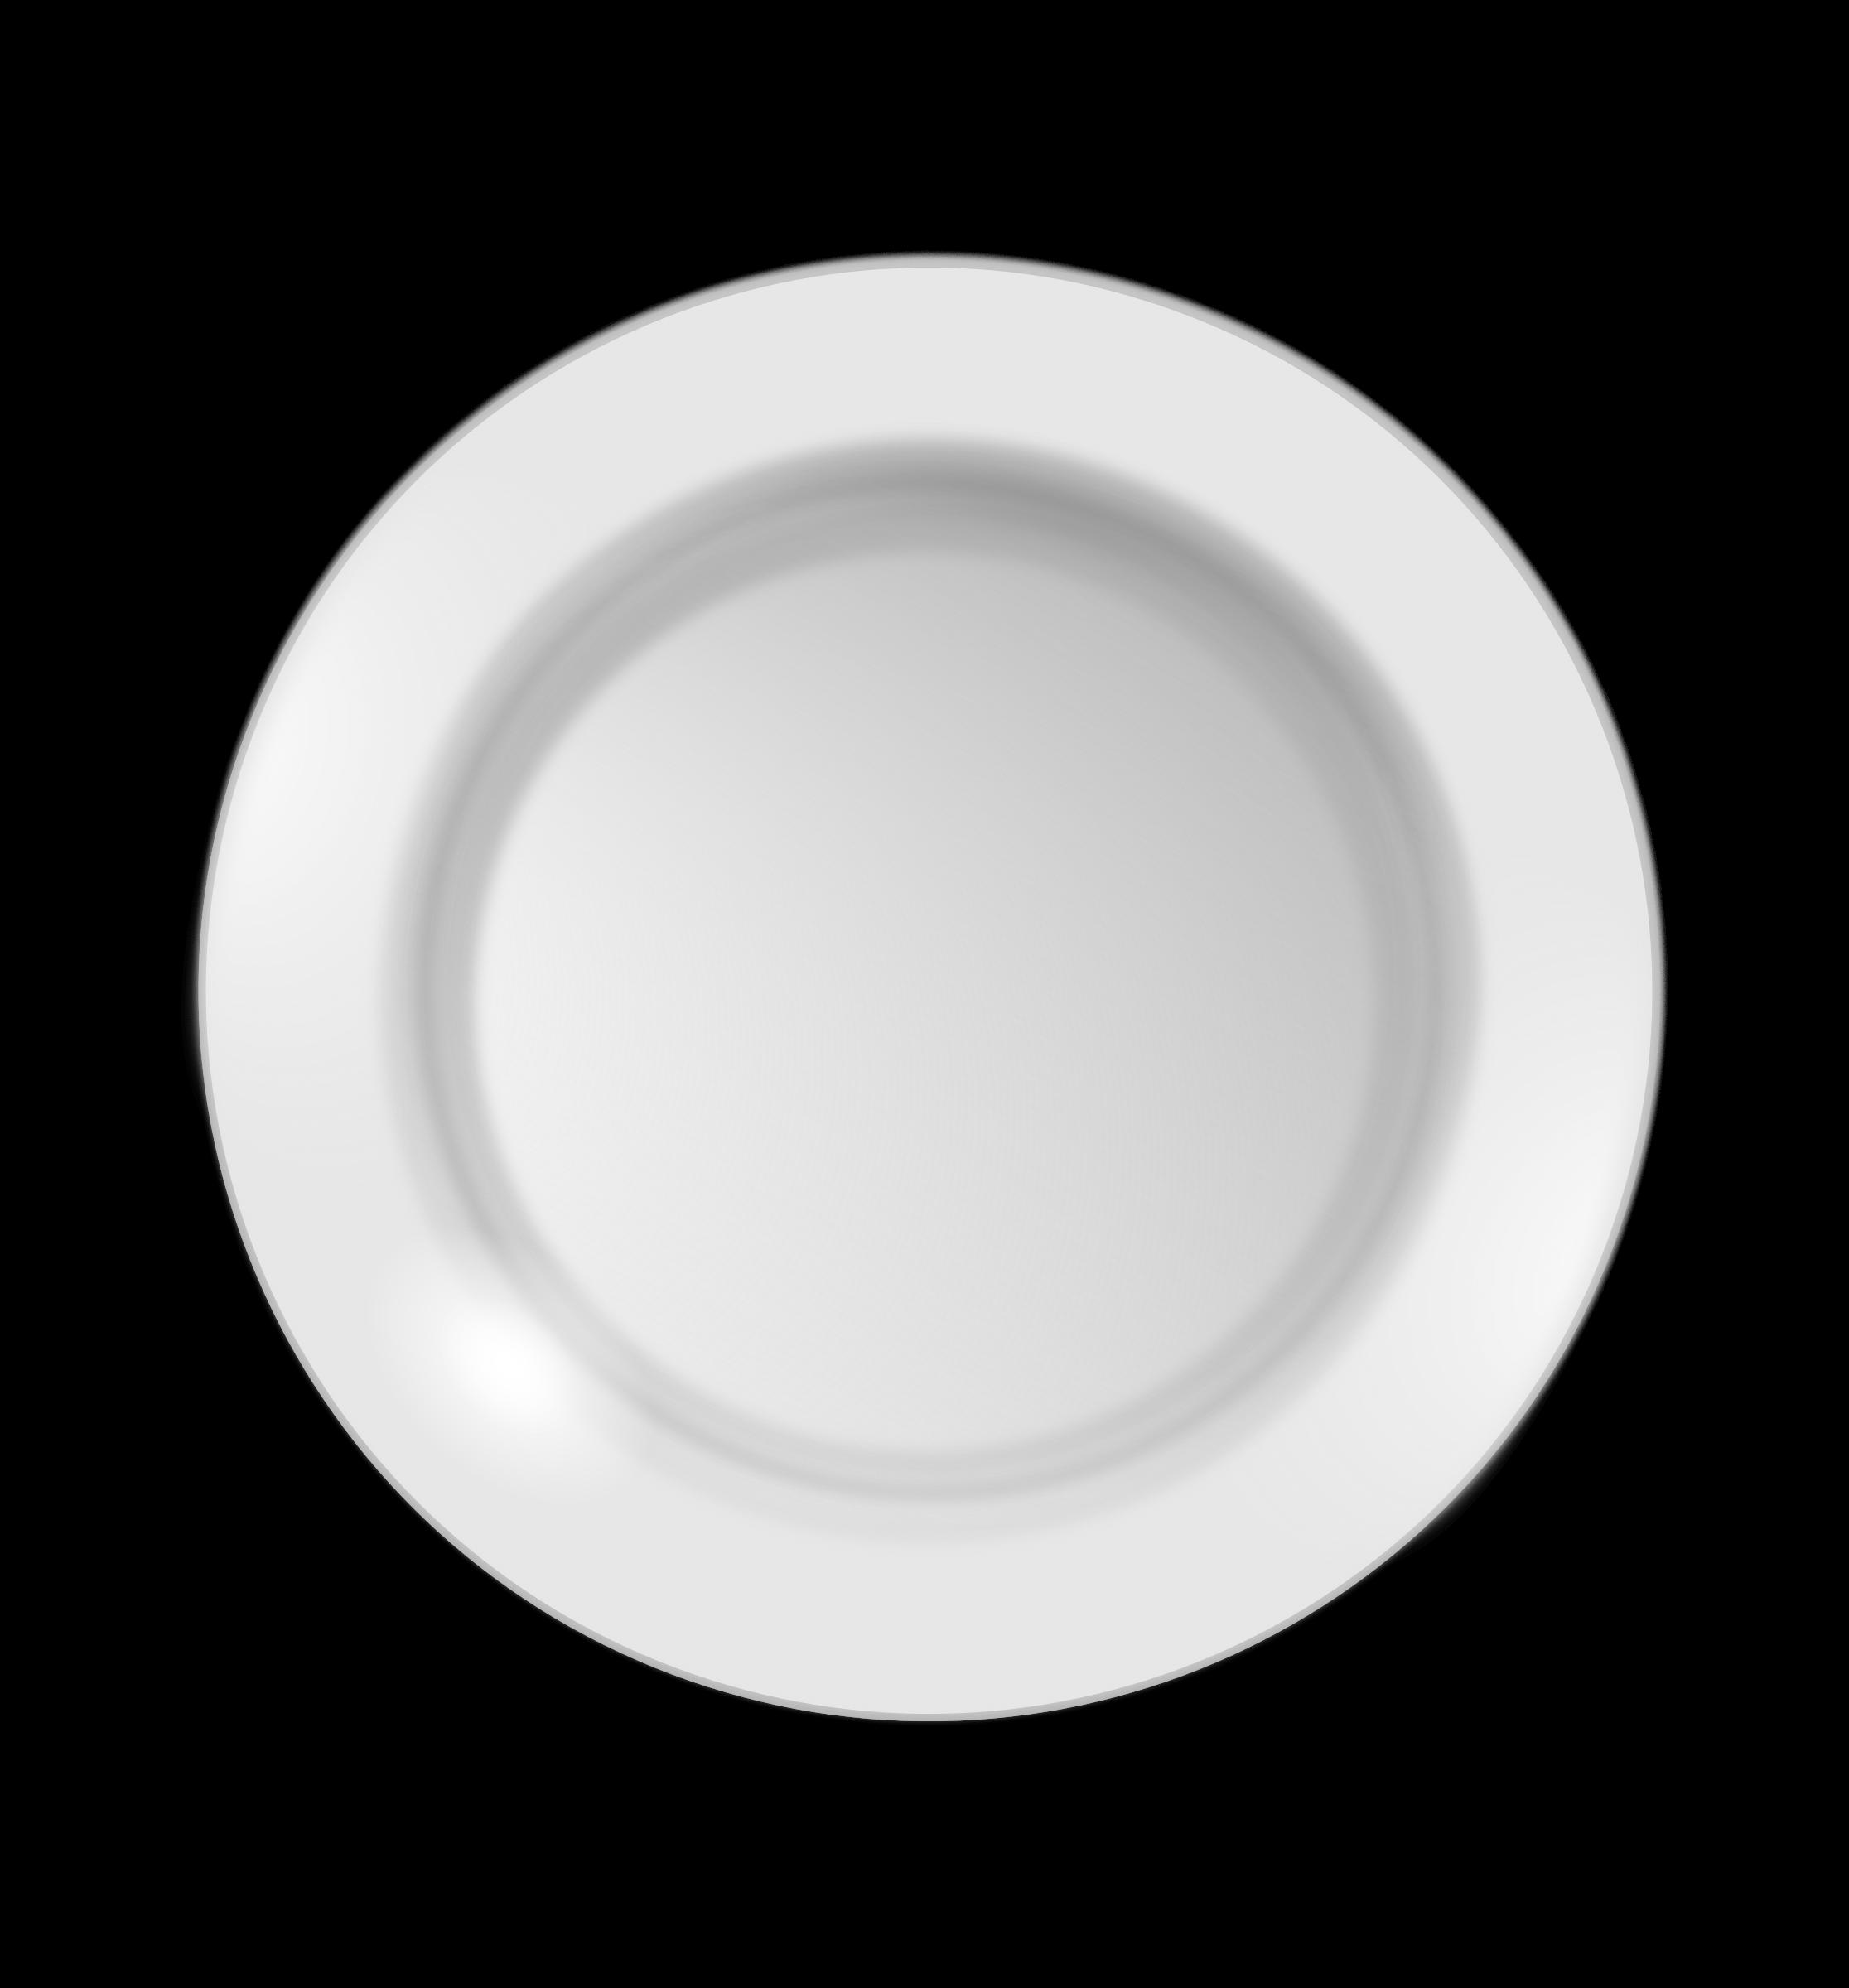 Dish transparent background plate